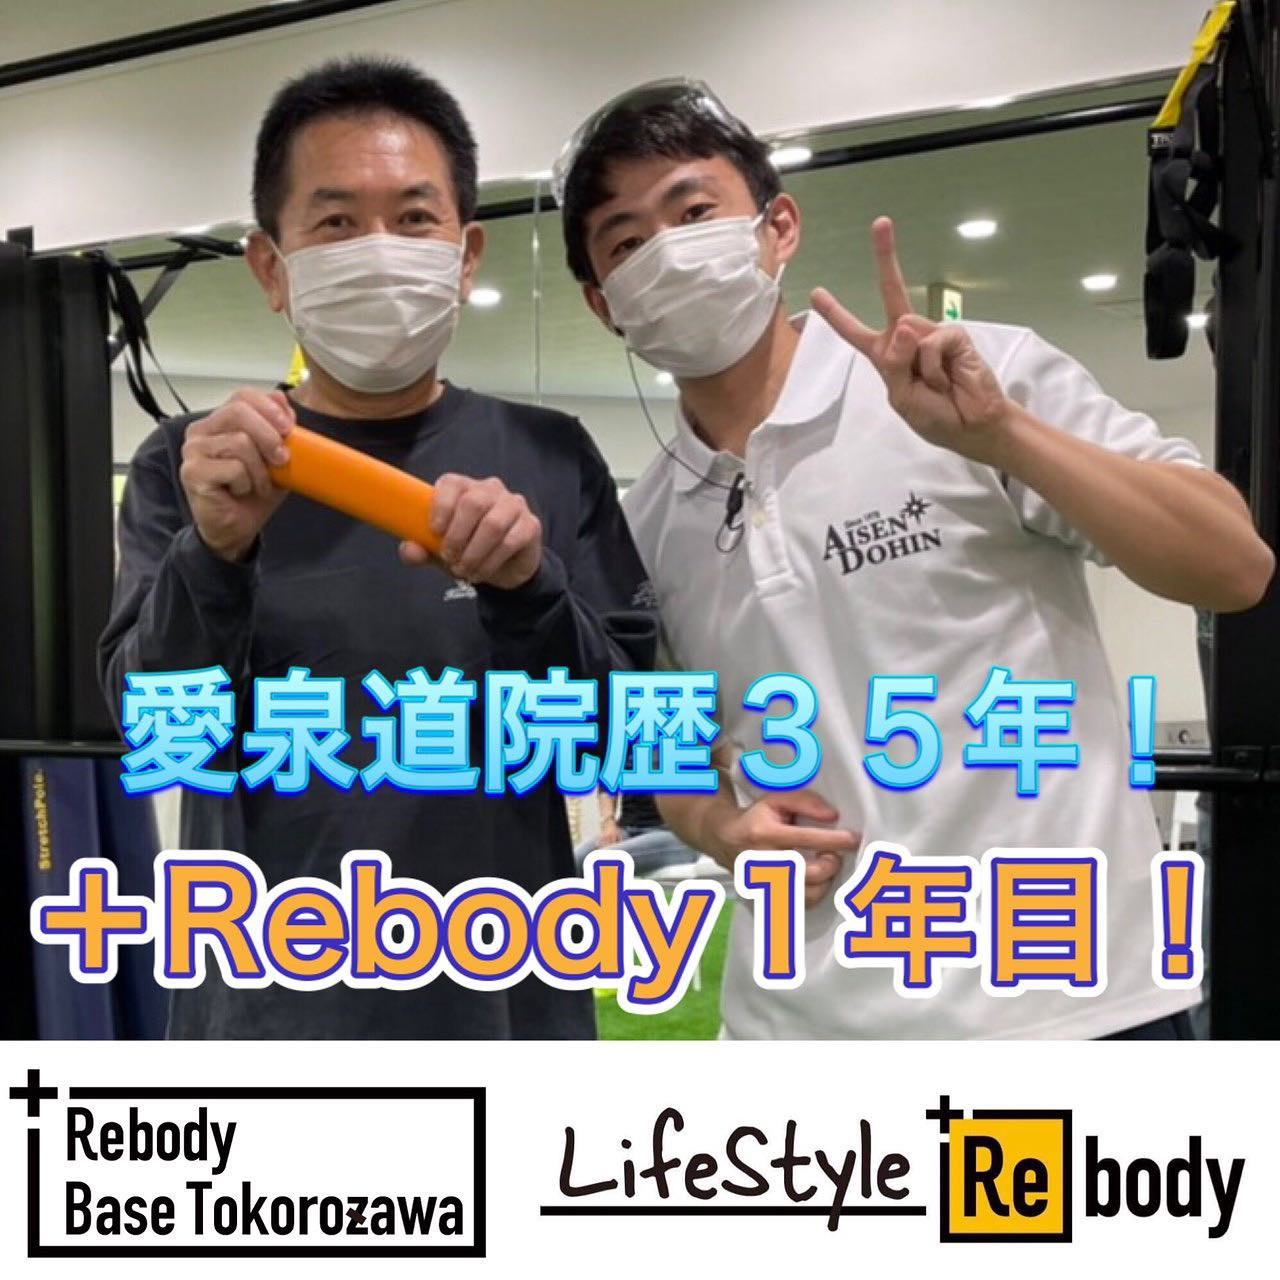 『 愛泉道院+Rebody       base Tokorozawa 』